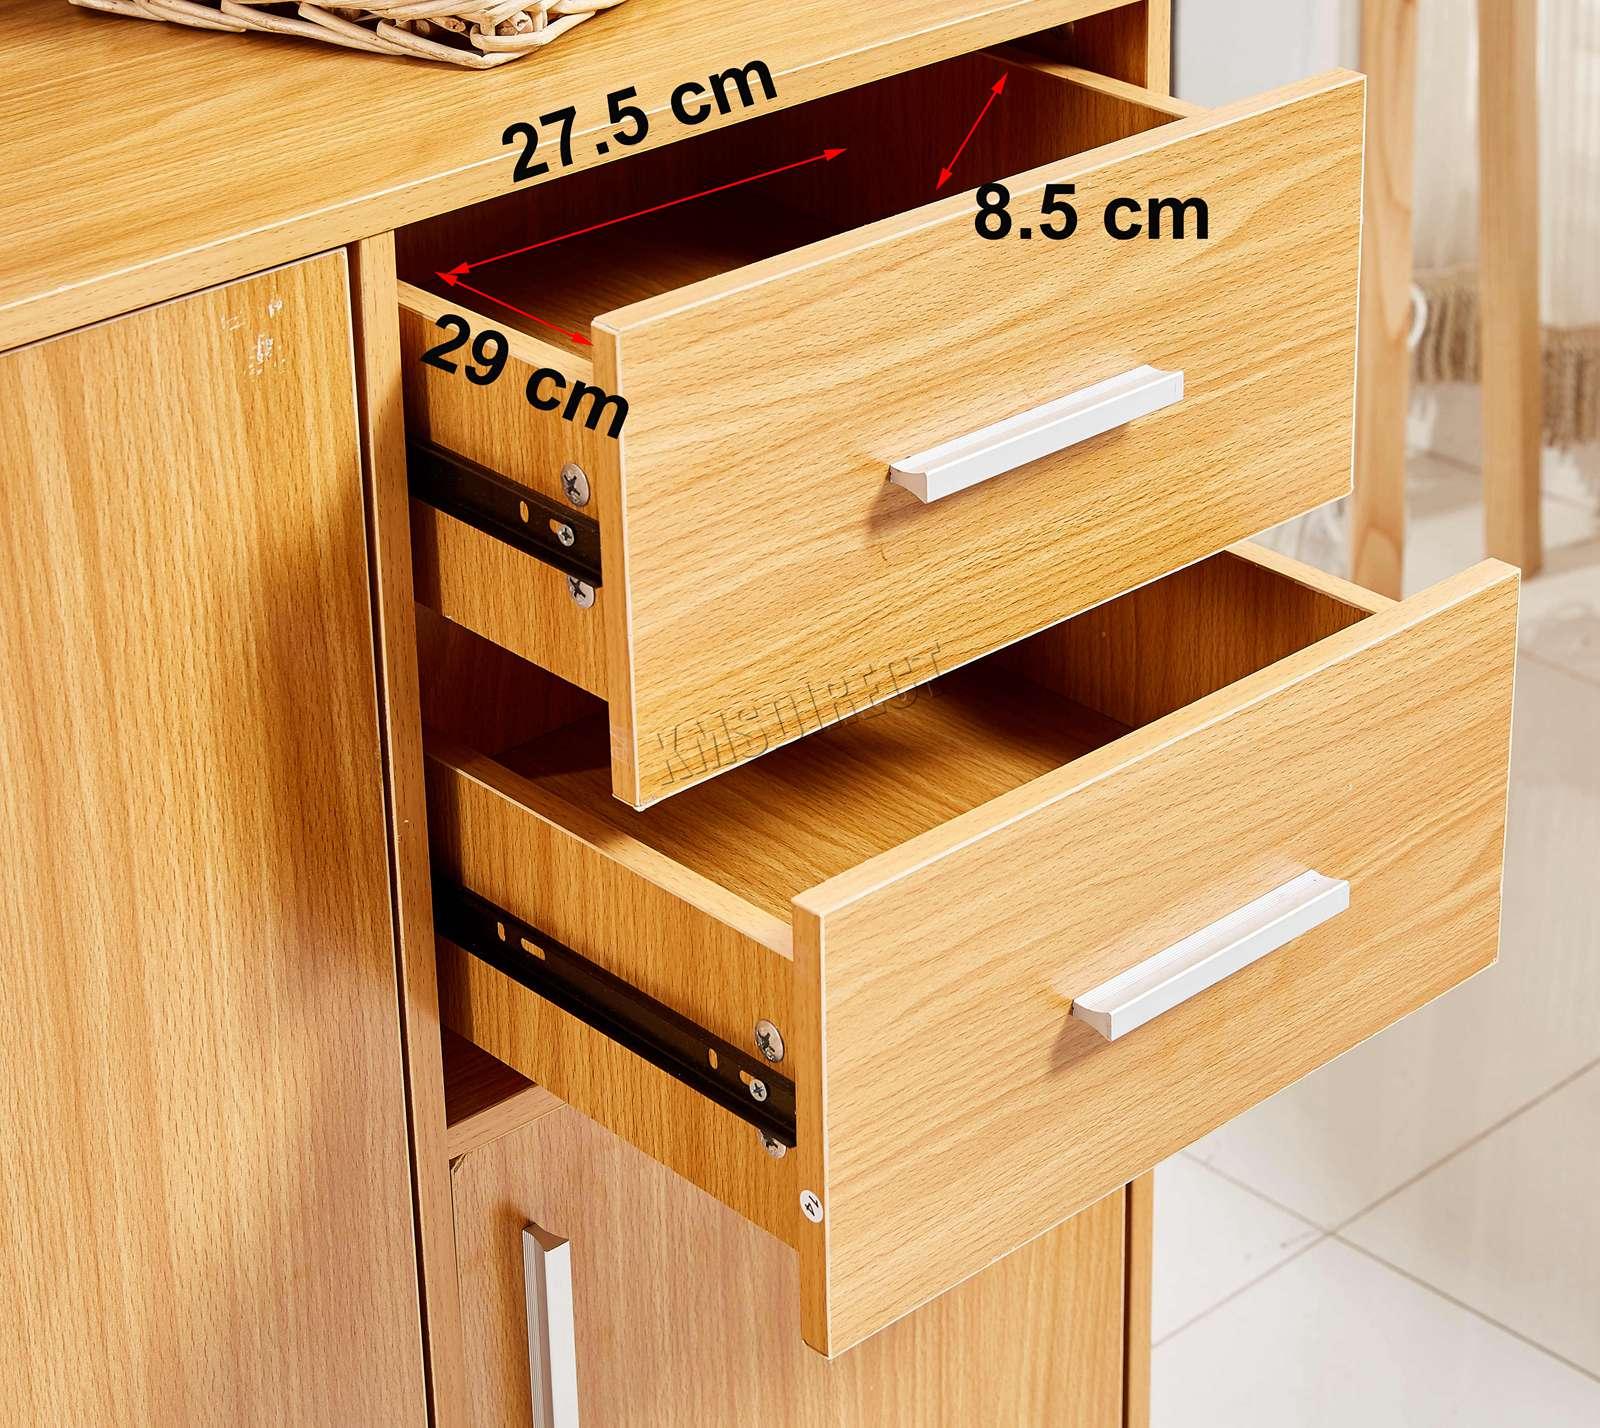 WestWood-Sideboard-Cabinet-Storage-tableware-Kitchen-Cupboard-Unit-PB-SSP01-NEW thumbnail 22